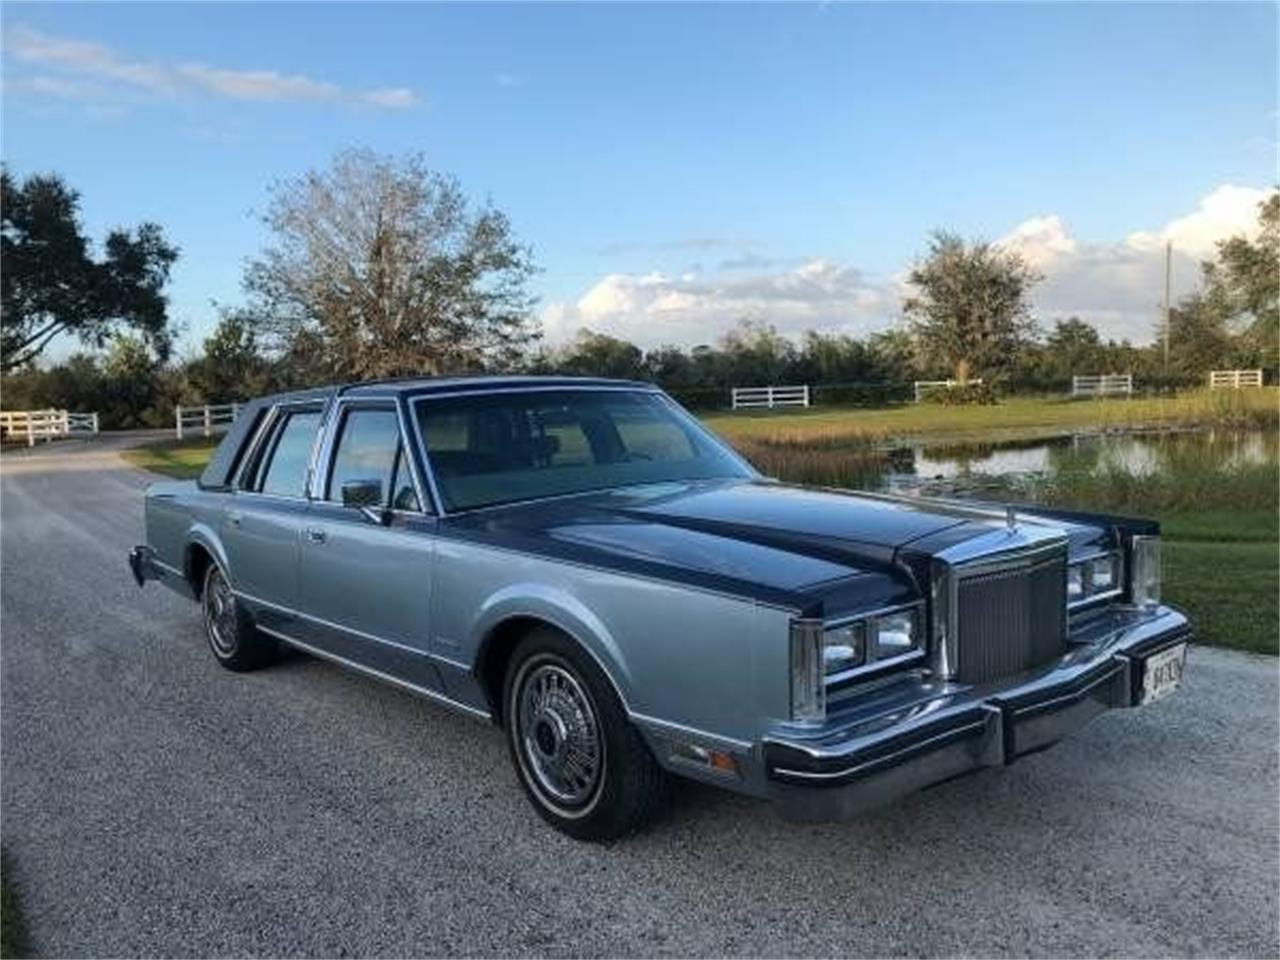 1983 Lincoln Town Car (CC-1422671) for sale in Punta Gorda, Florida